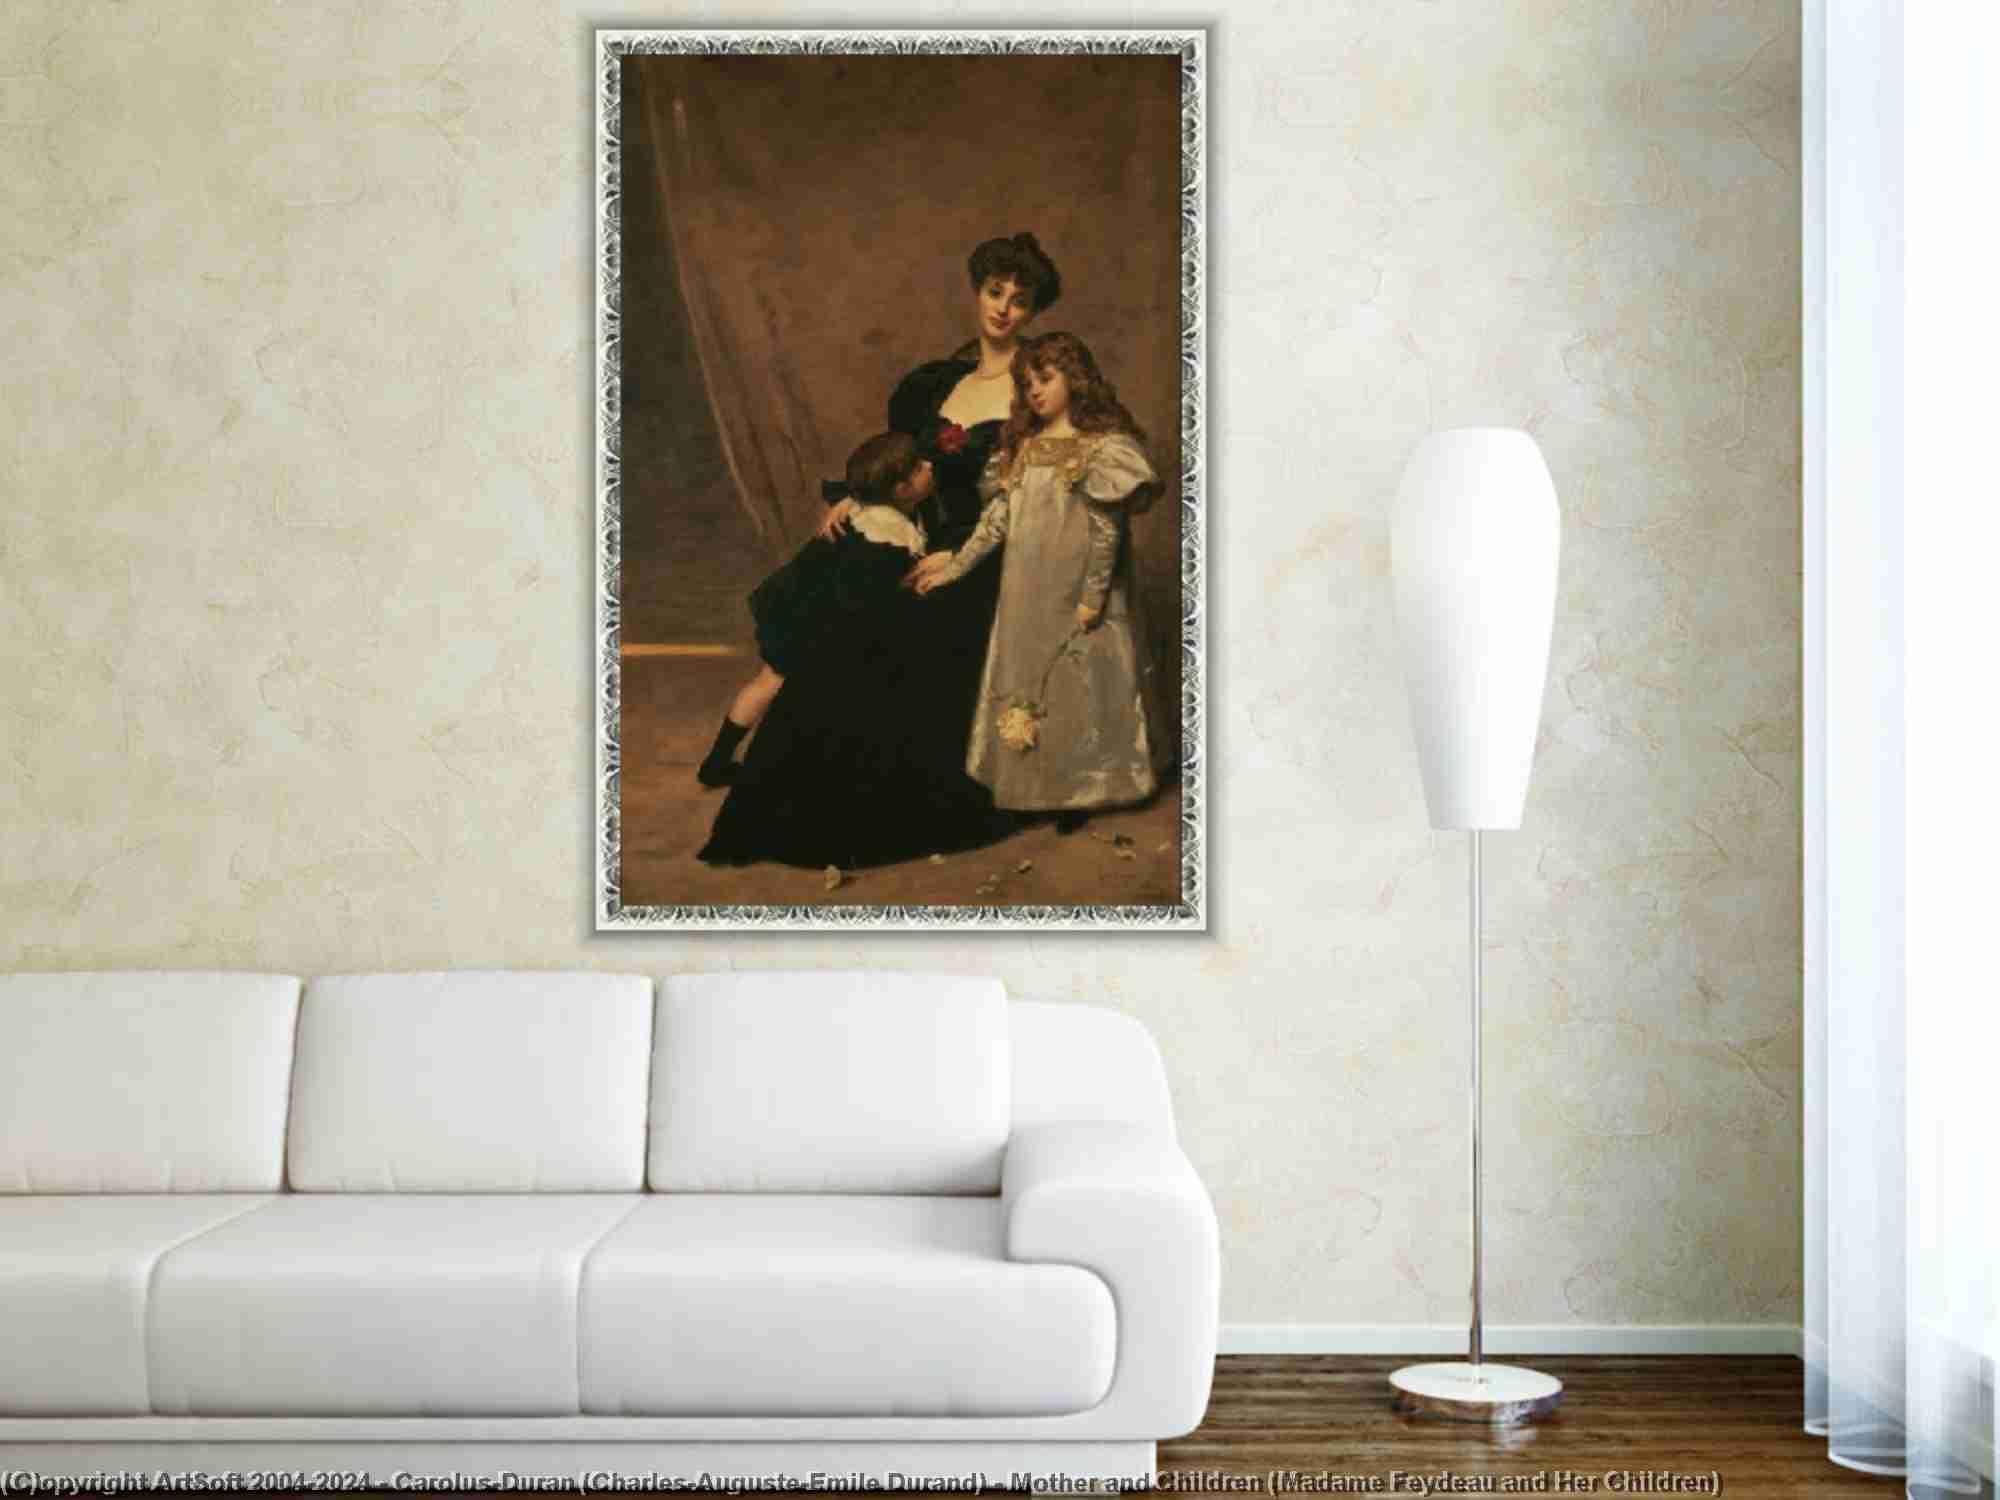 Carolus-Duran (Charles-Auguste-Emile Durand) - Mother and Children (Madame Feydeau and Her Children)